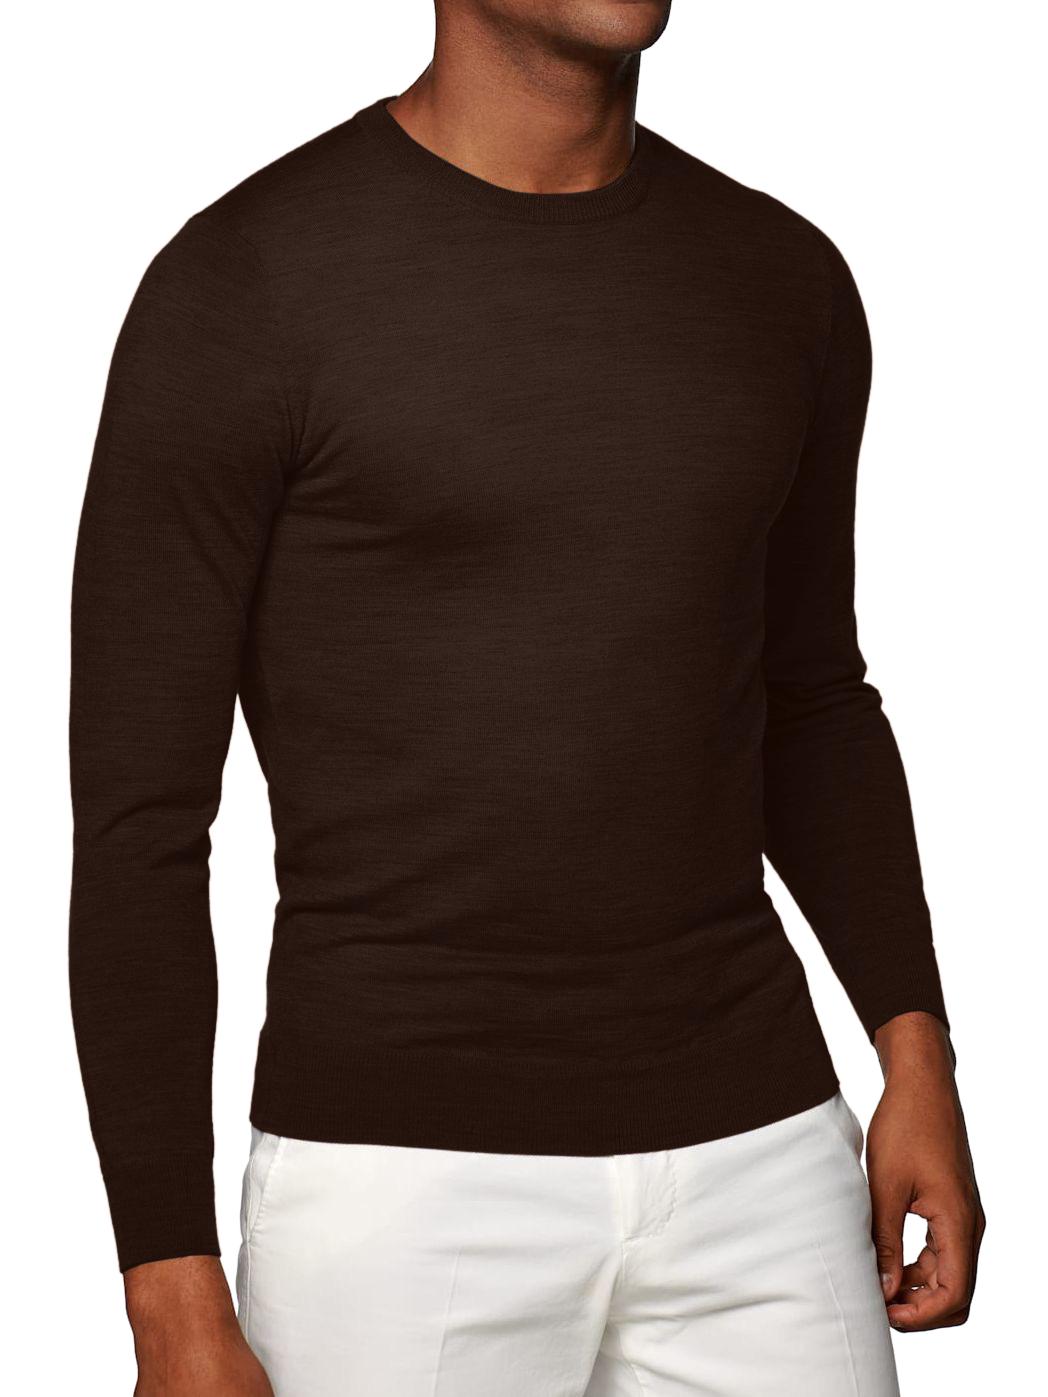 Chocolate Cashmere Crew Neck Sweater